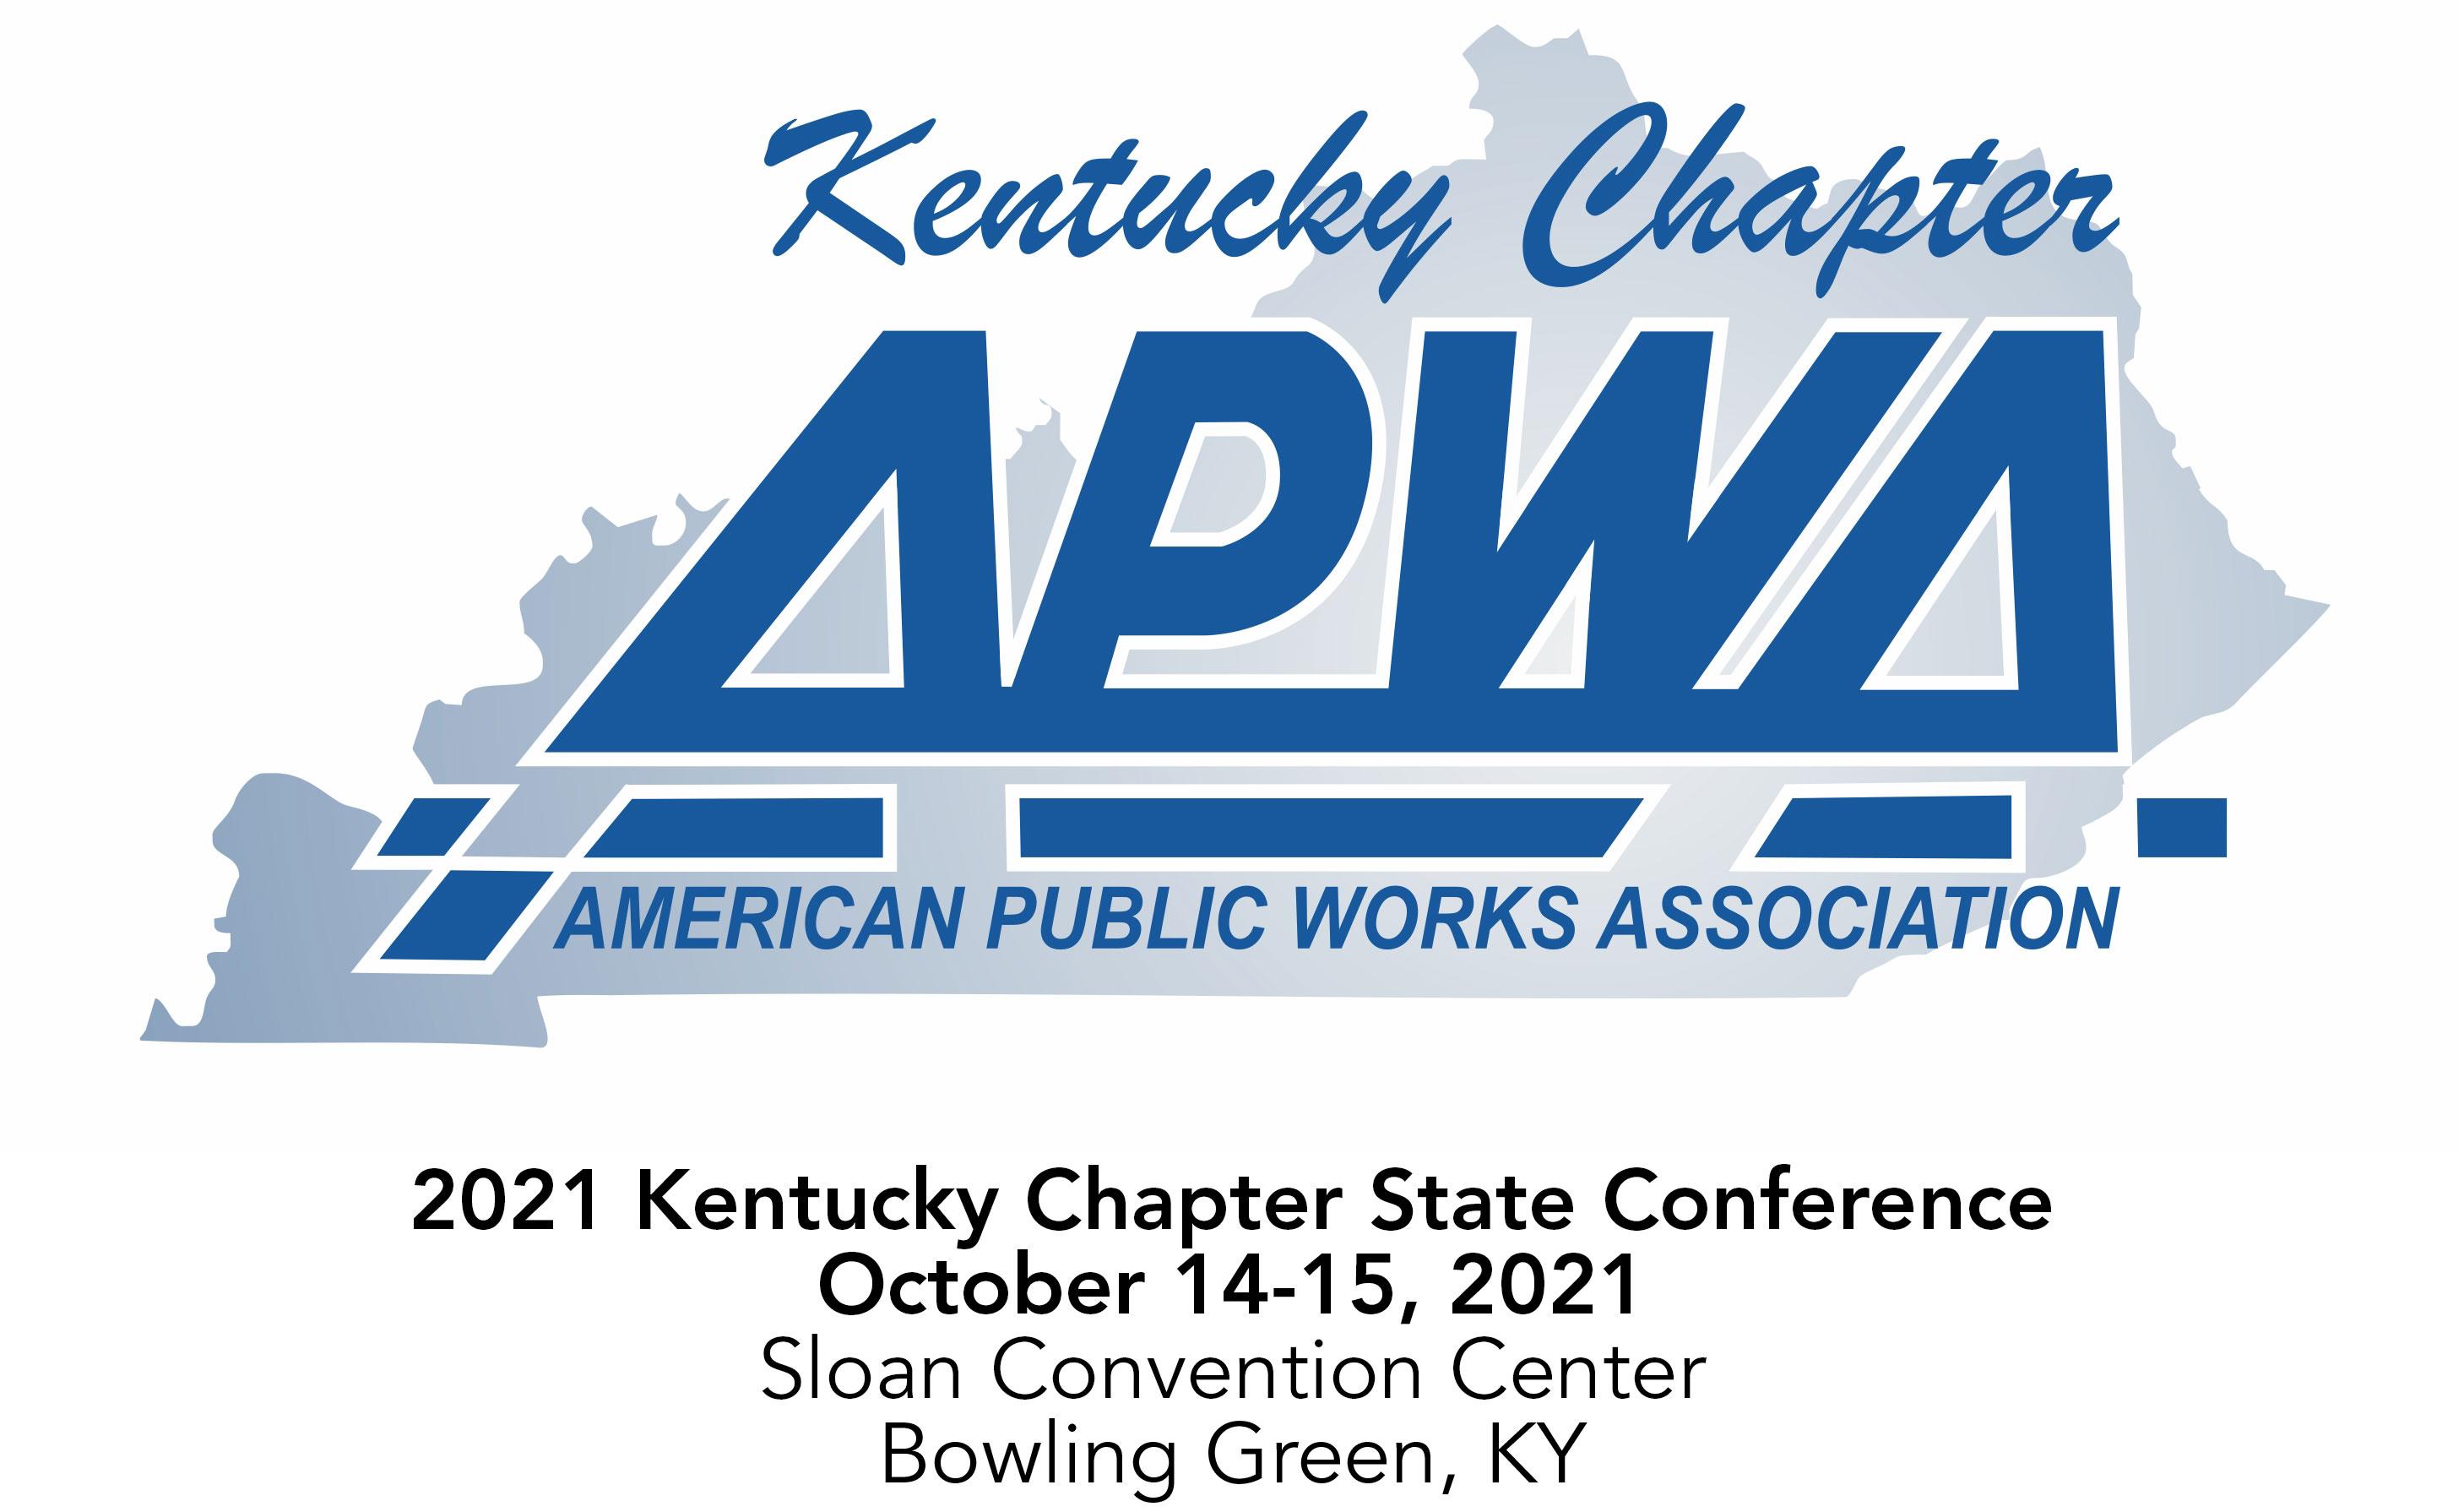 APWA-Kentucky-Chapter-Logo-2021-conf.jpg